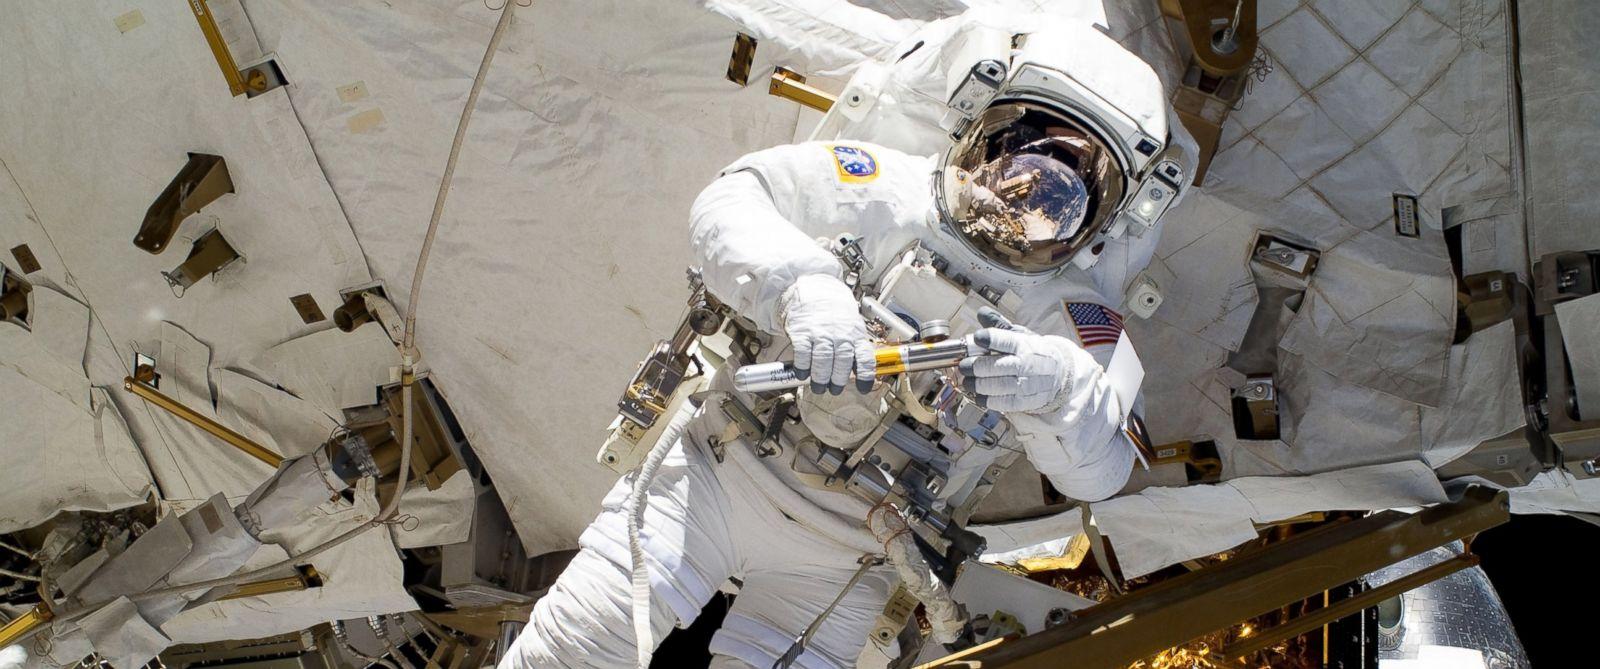 PHOTO: NASA astronaut Alvin Drew participates in an EVA on the International Space Station on Feb. 28, 2011.